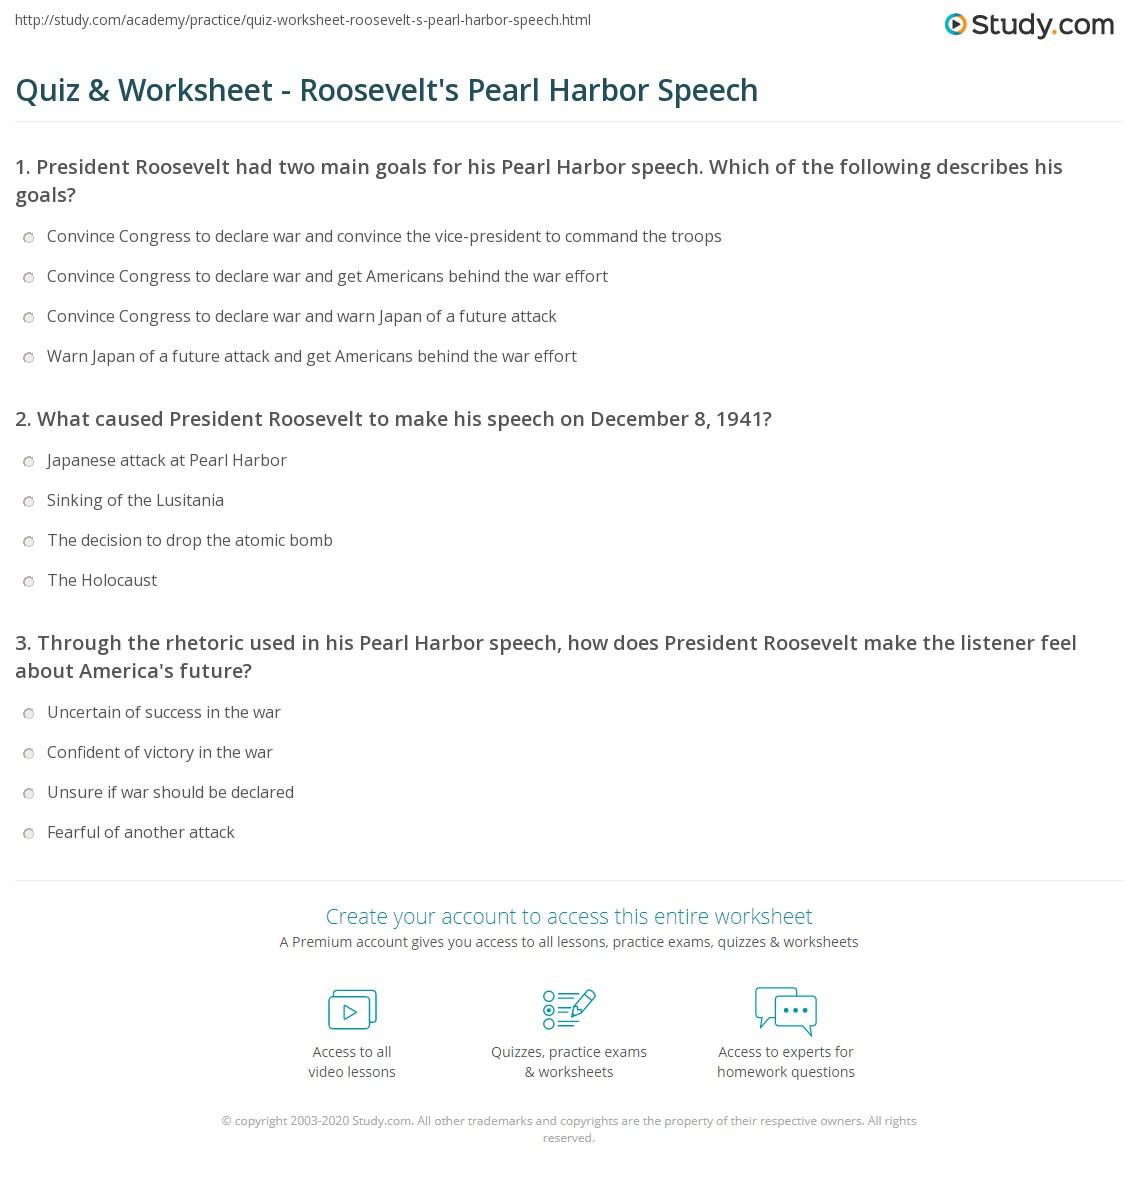 Quiz Worksheet Roosevelts Pearl Harbor Speech Study